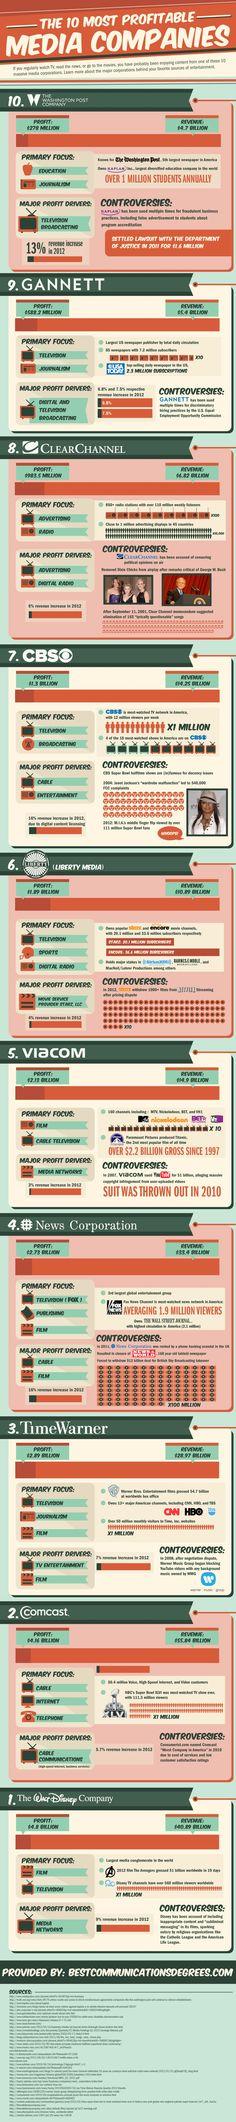 Today's Most Profitable Media Companies